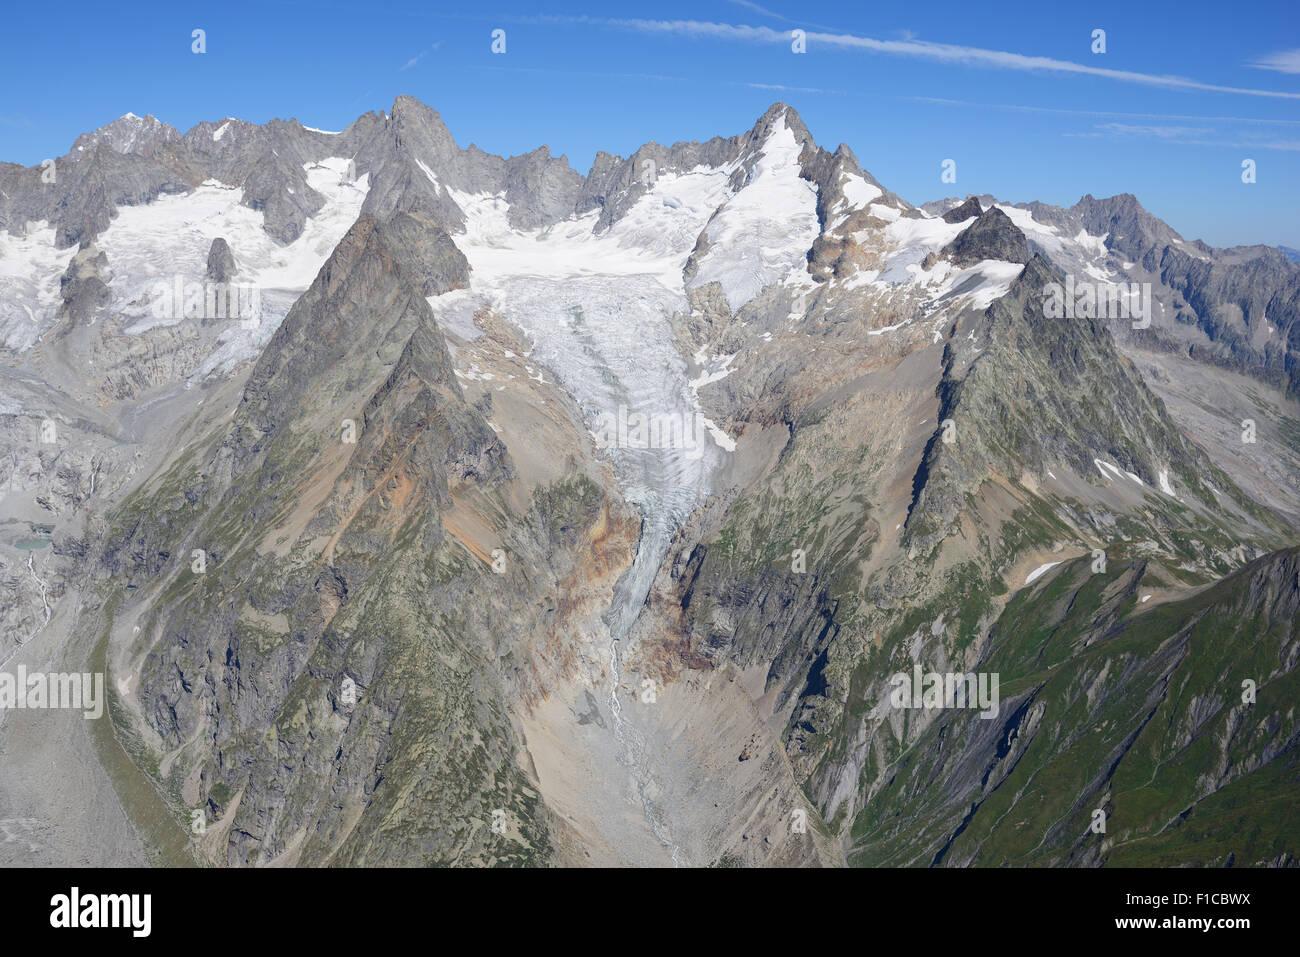 AIGUILLE DE TRIOLET (3870m) and MONT DOLENT (3820m) (aerial view). Val Ferret, Courmayeur, Aosta Valley, Italy. - Stock Image